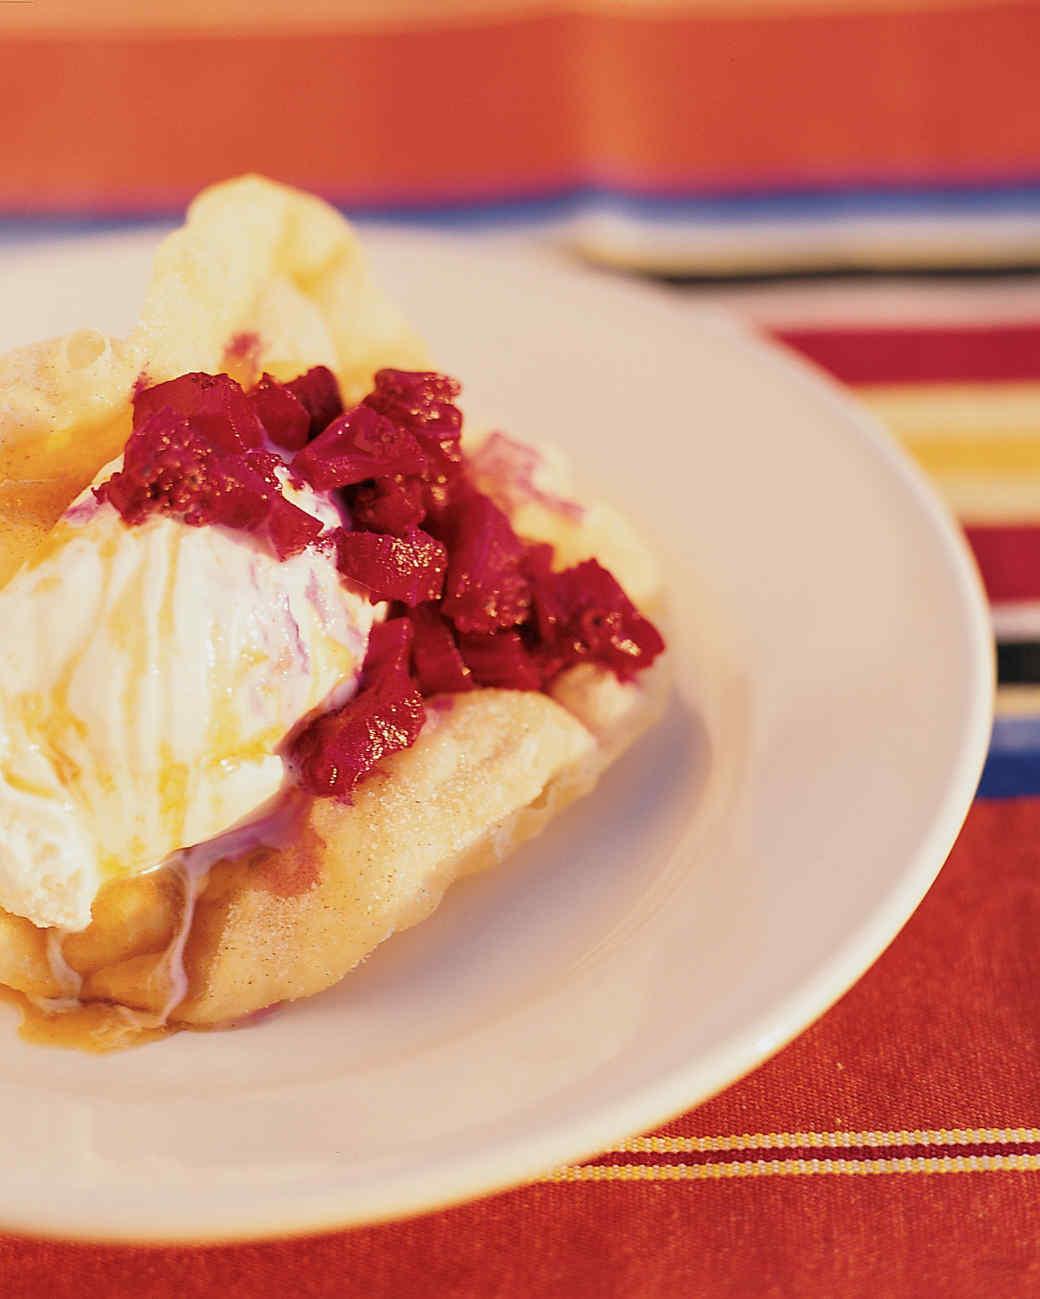 Bunuelos with Vanilla Ice Cream and Cactus Berries